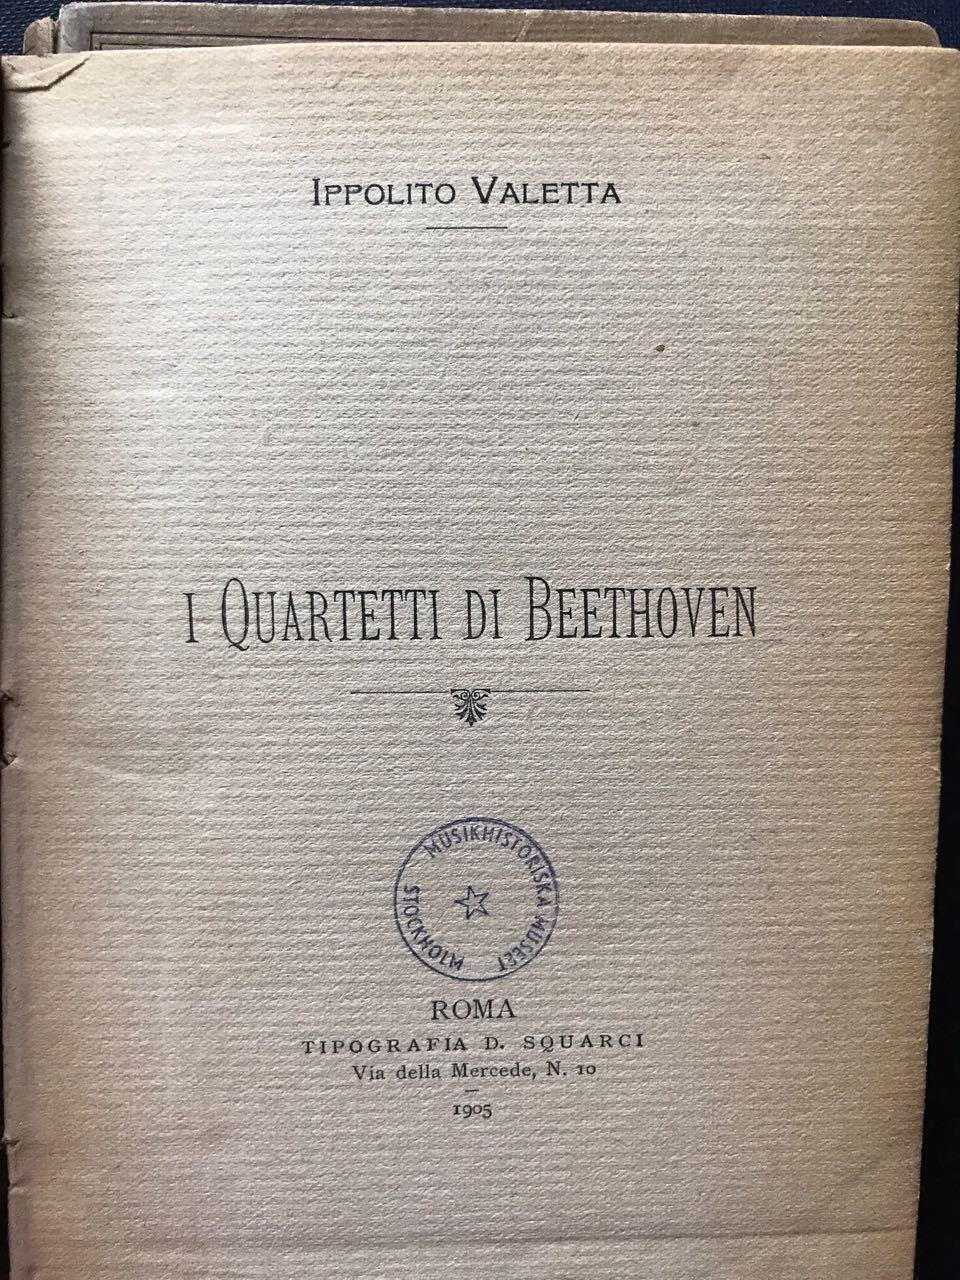 Valetta Ippolito